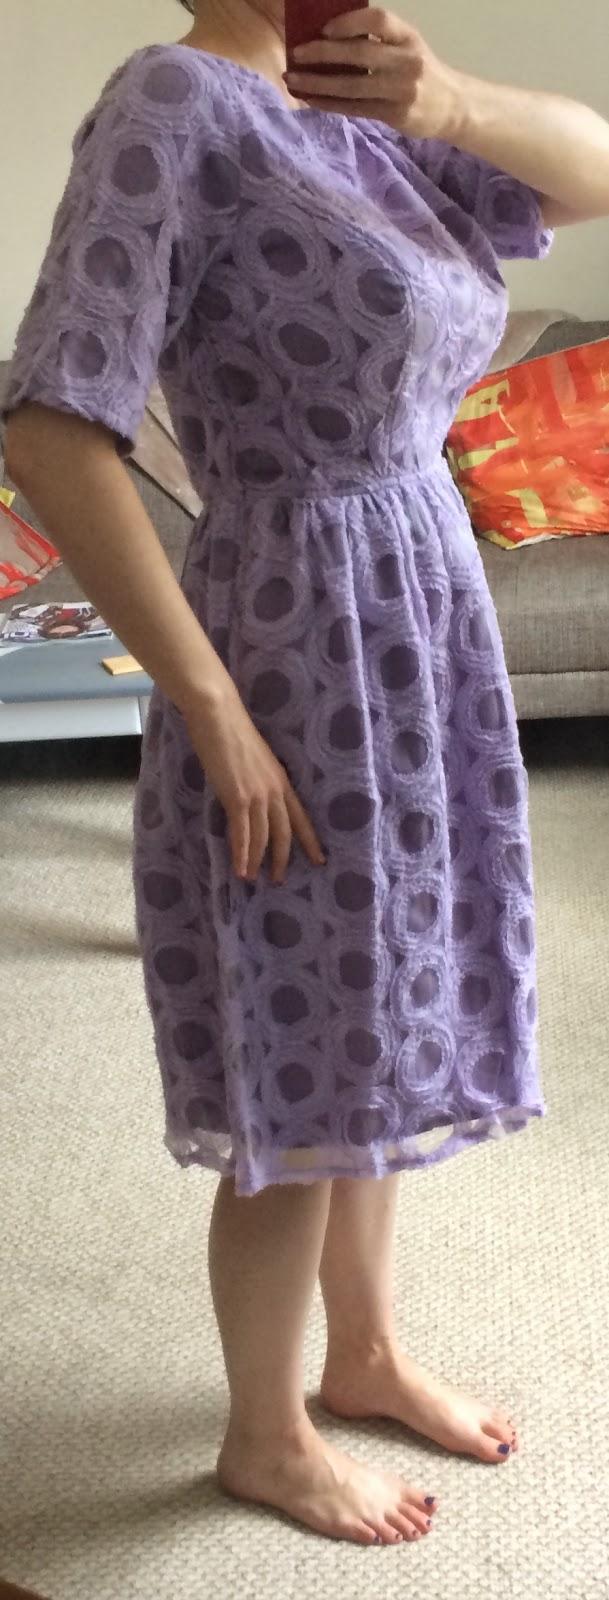 A custom-sized dress from eShakti